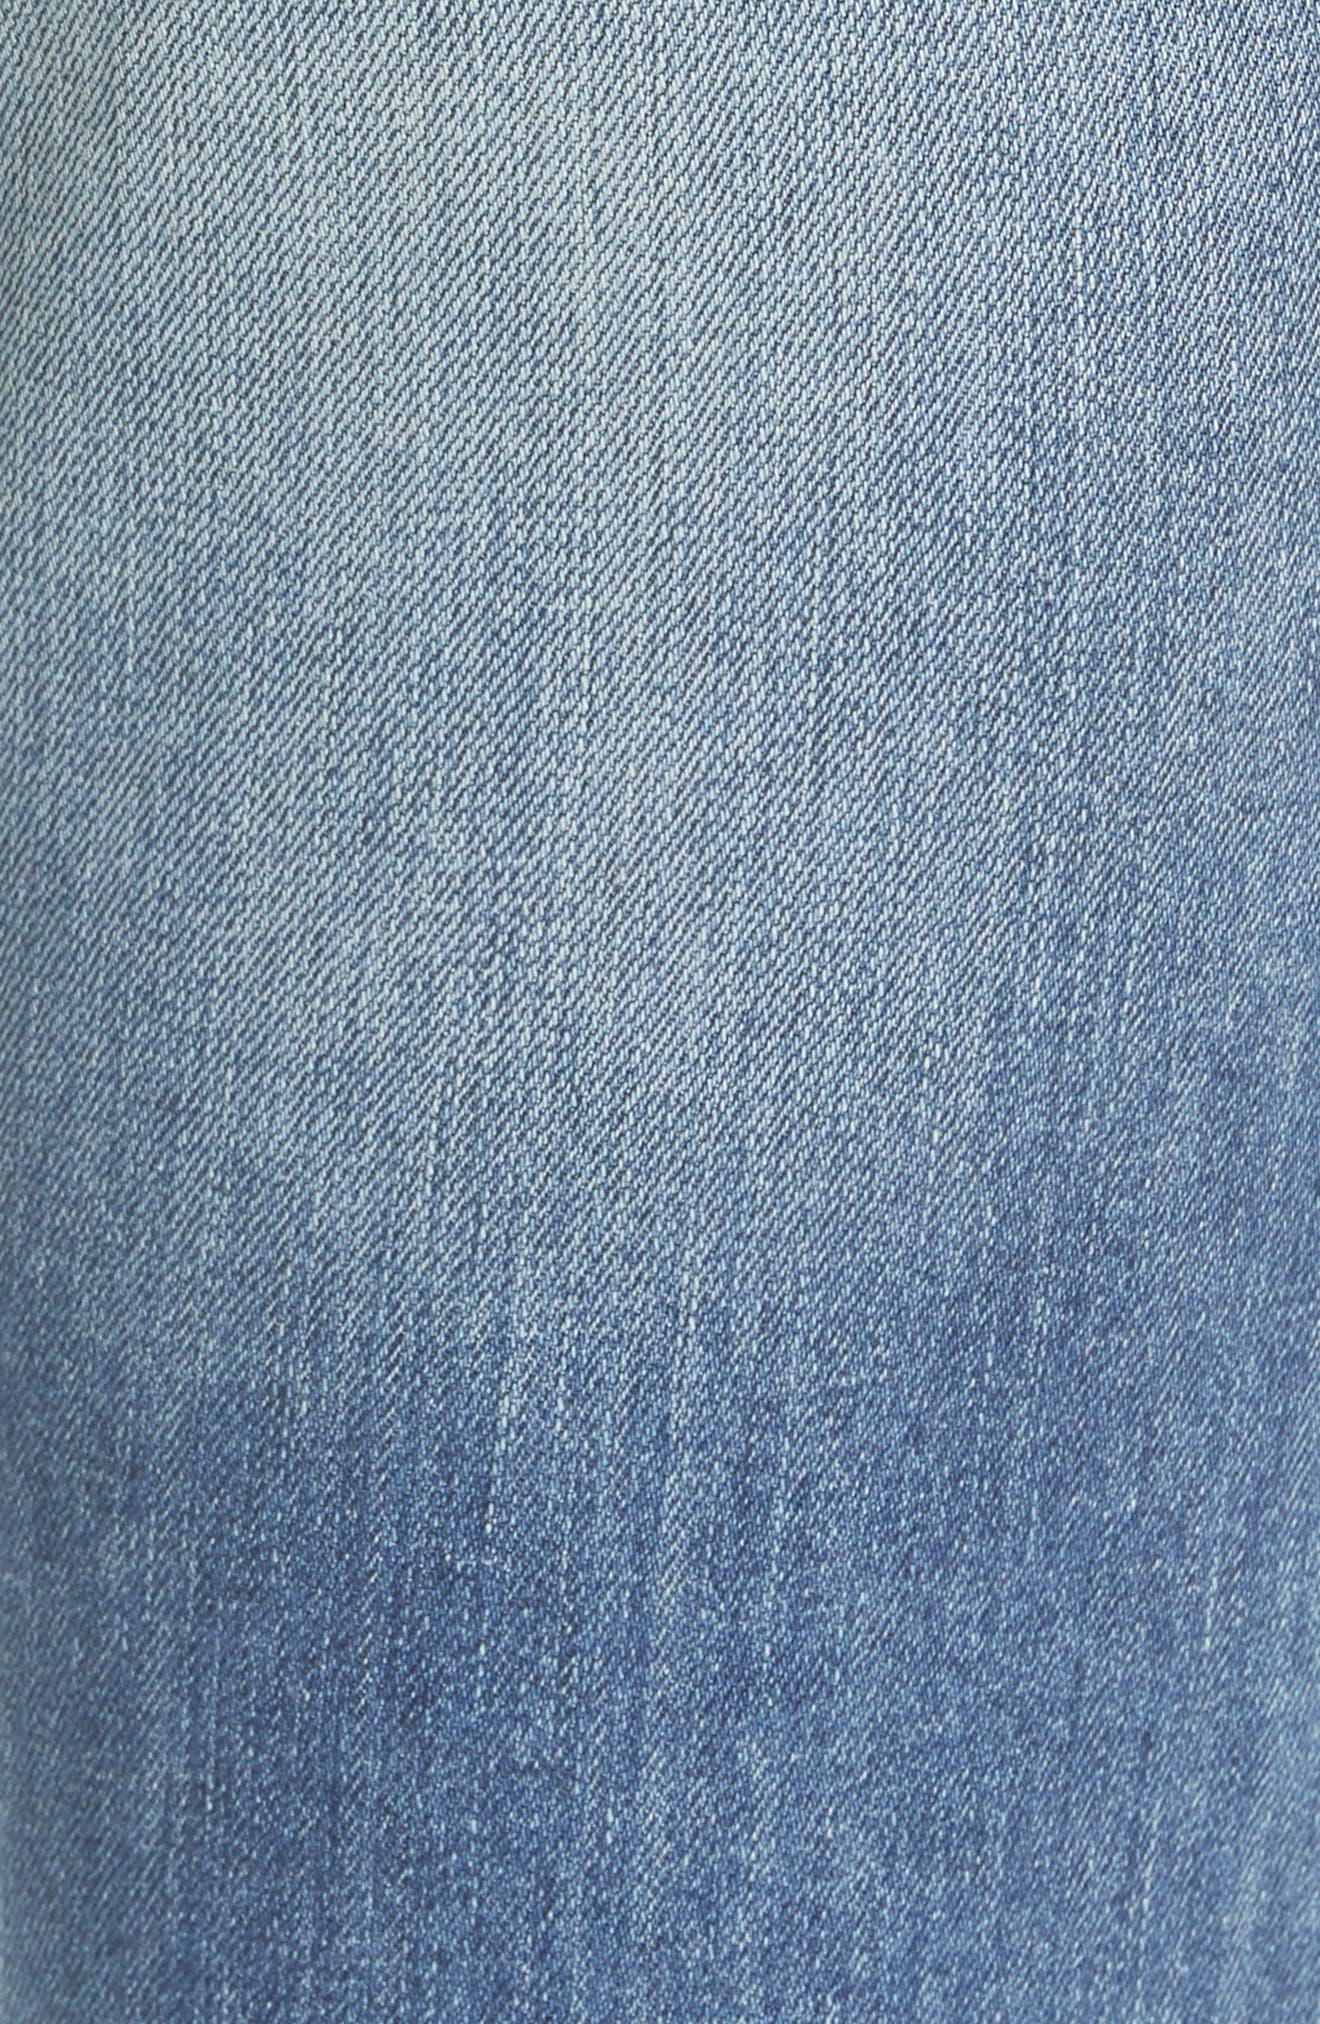 NILI LOTAN, Crop French Military Jeans, Alternate thumbnail 6, color, DUANE WASH